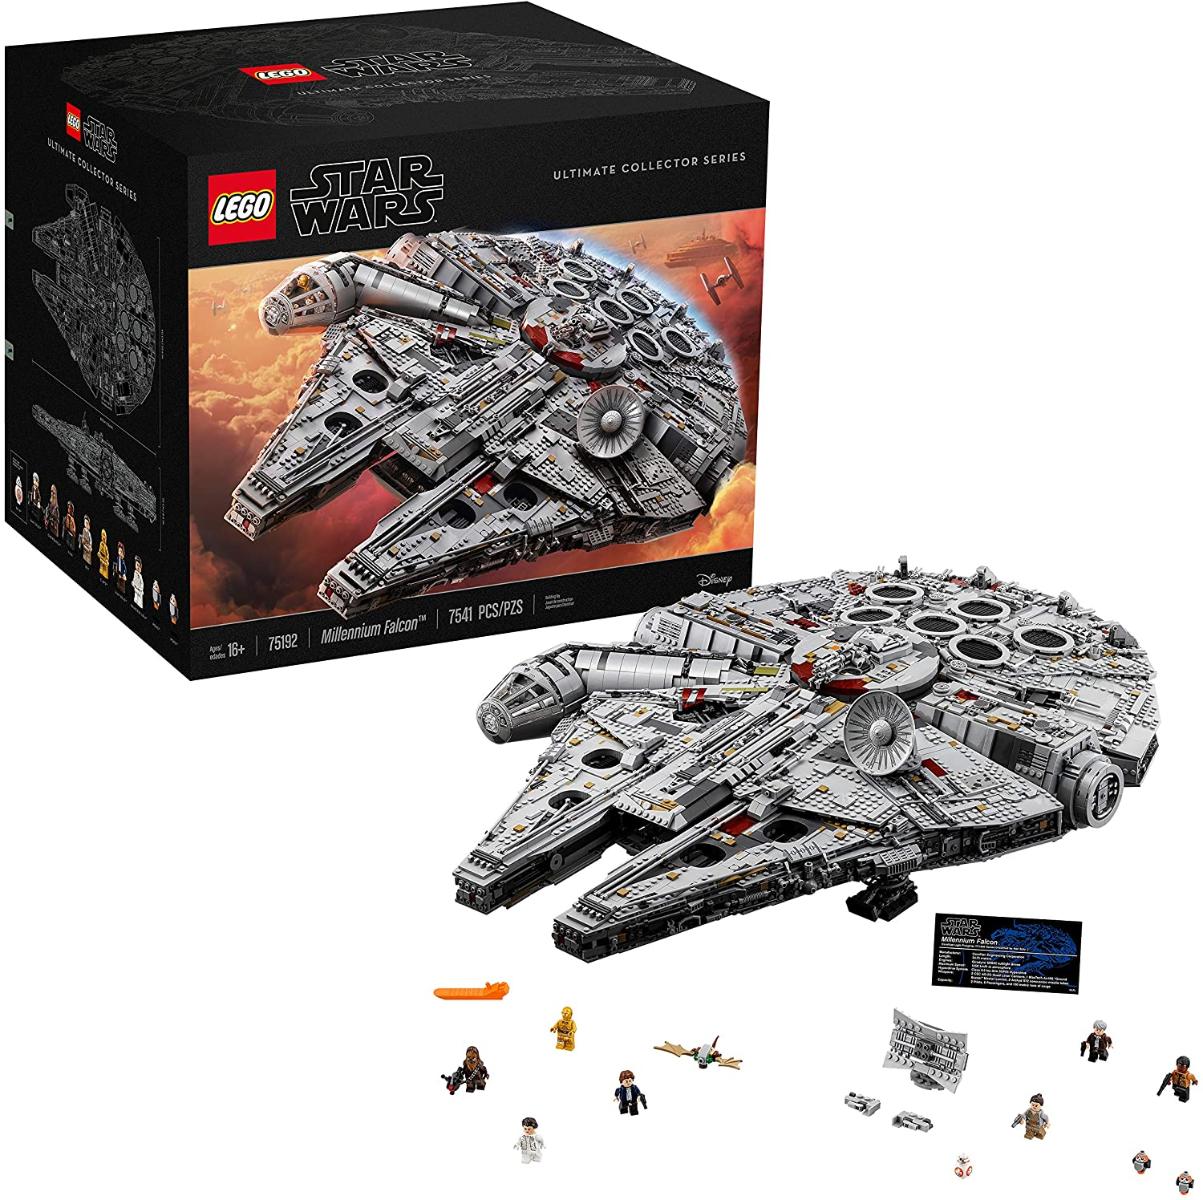 LEGO Star Wars UCS Millenium Falcon